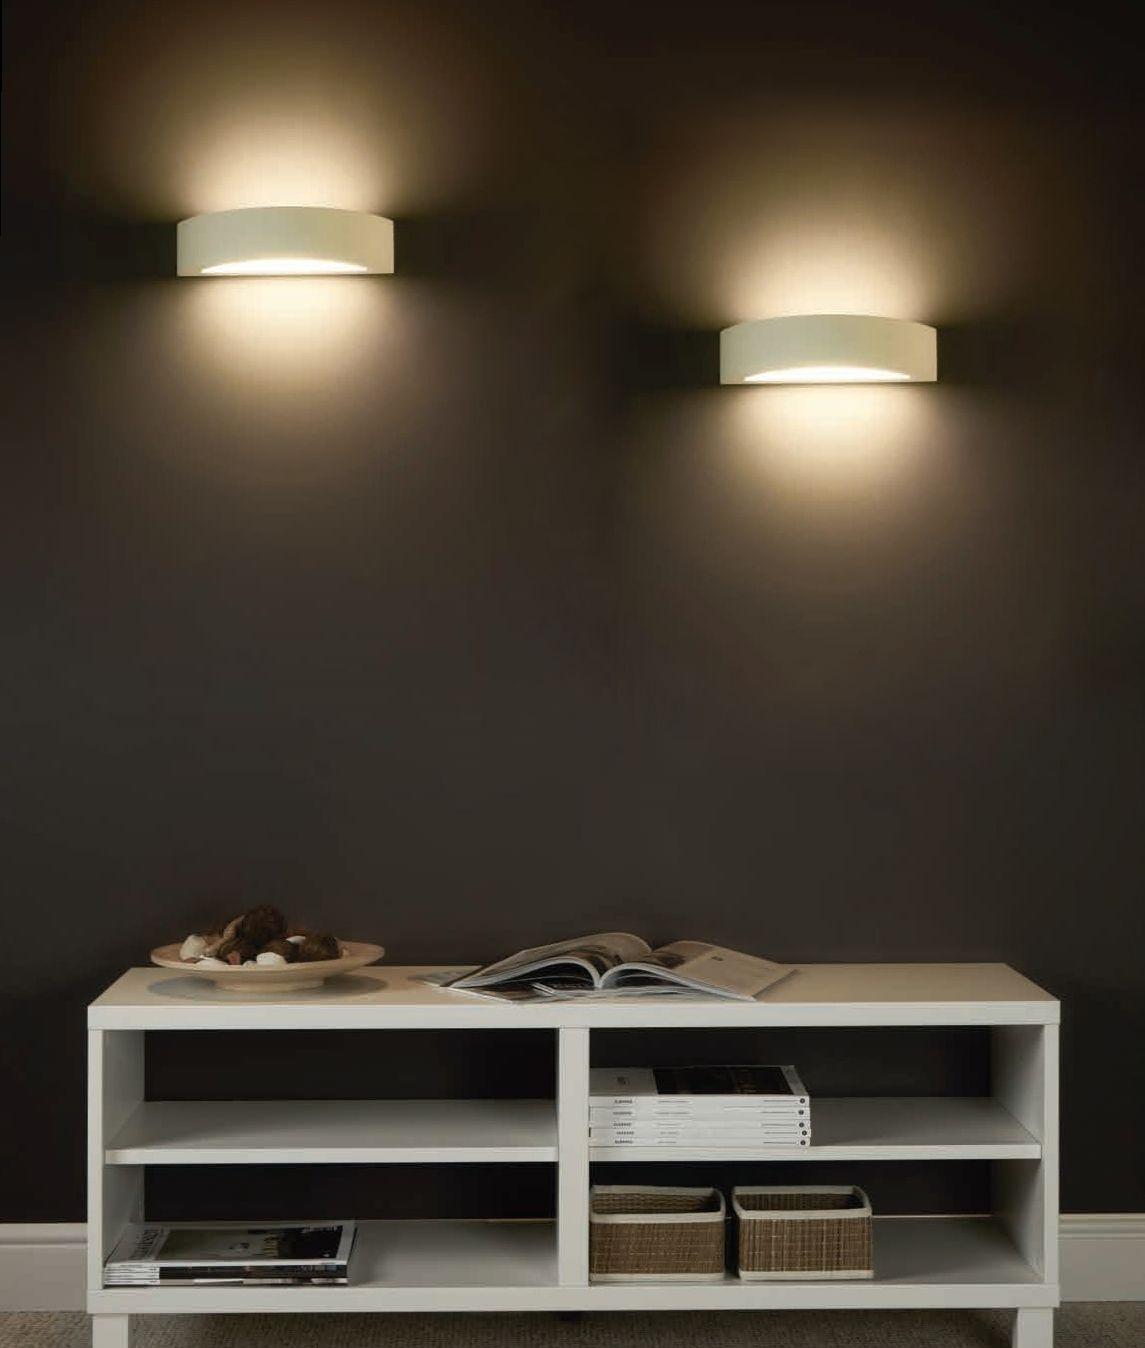 wall washing lighting. LED Plaster Wall Washing Semicircular Light With Diffusers Lighting L